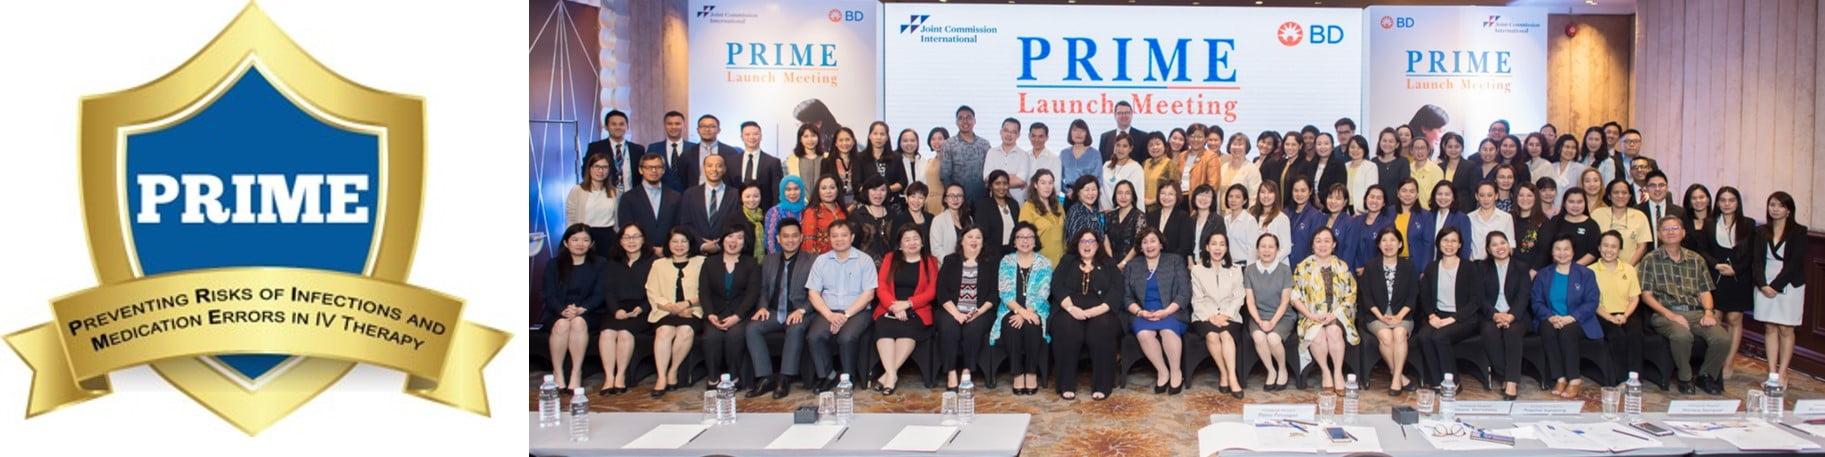 BD Lancar Pencegahan Risiko Jangkitan dan Kesilapan Ubatan dalam Terapi IV (PRIME) di Asia 2